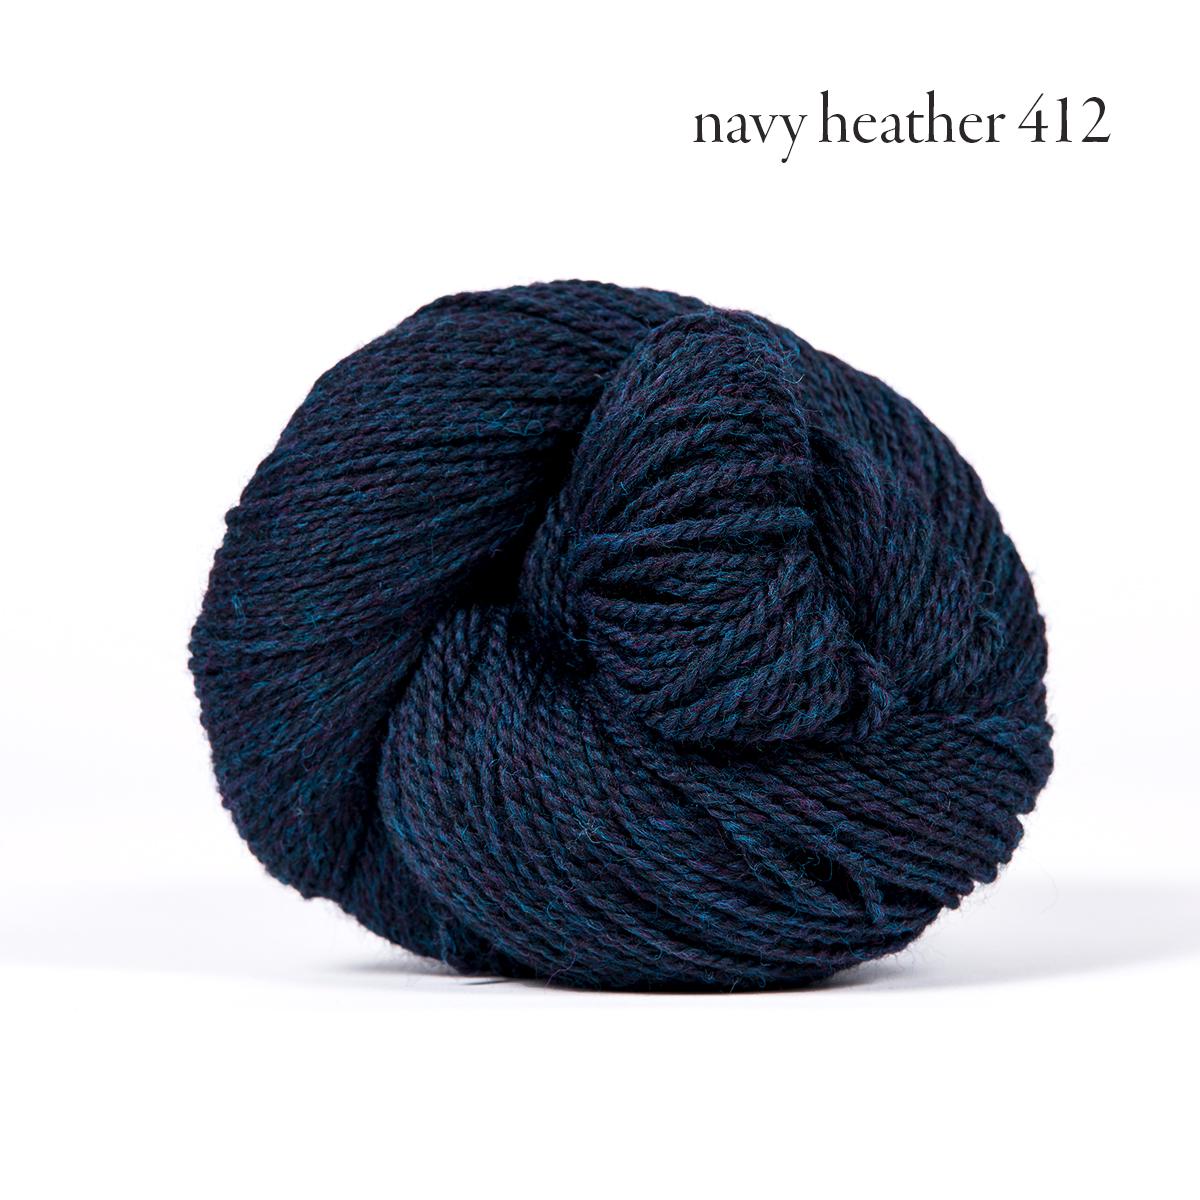 navy heather 412.jpg